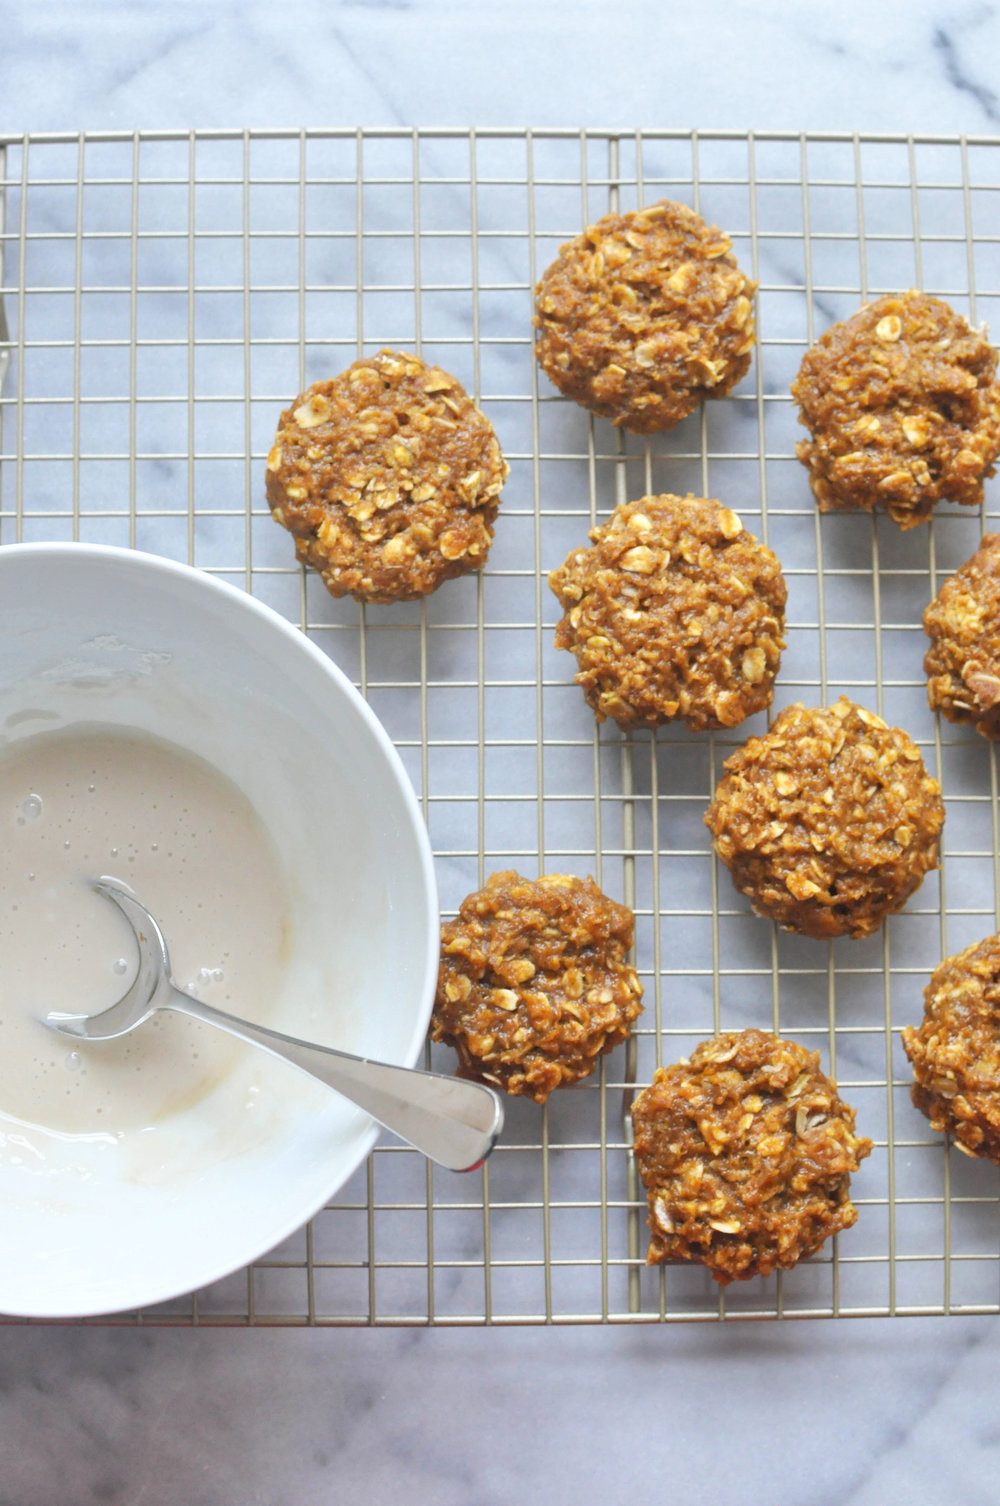 Healthier Pumpkin Spice Cookies - a delicious, fall dessert or snack | Shiny Happy Bright